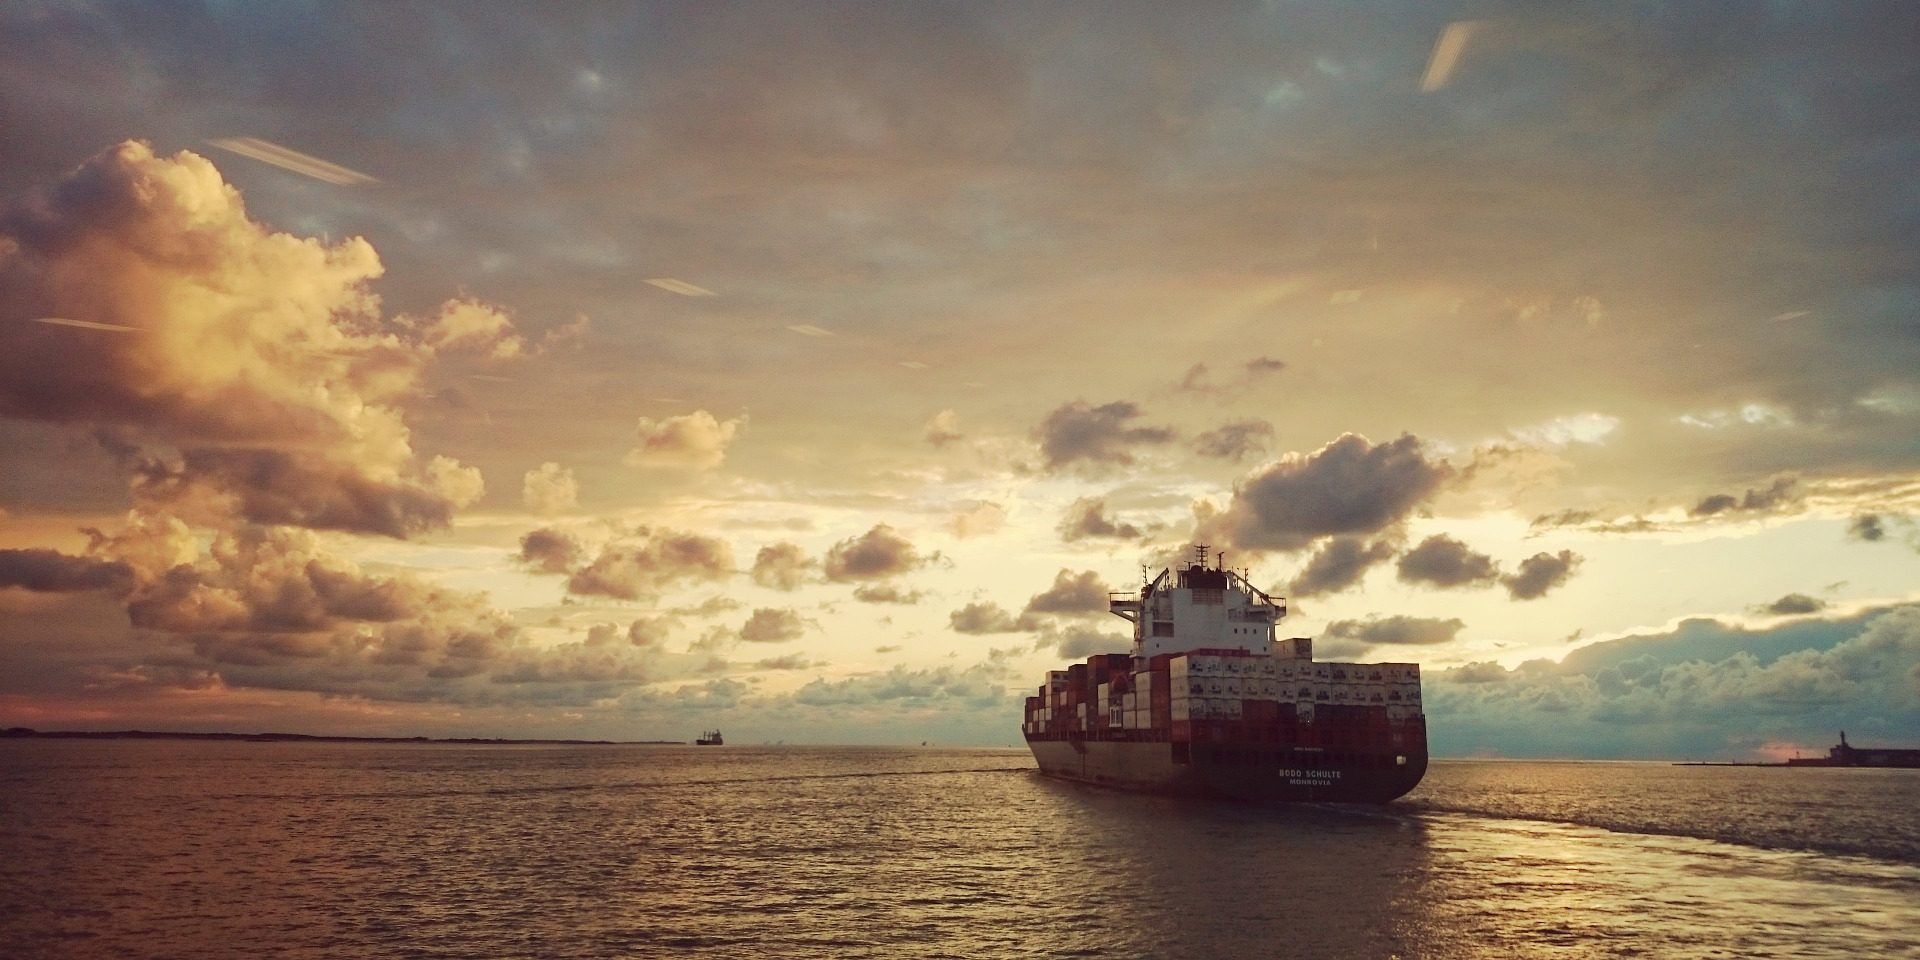 Технологии ICEYE выявят «темные» морские суда